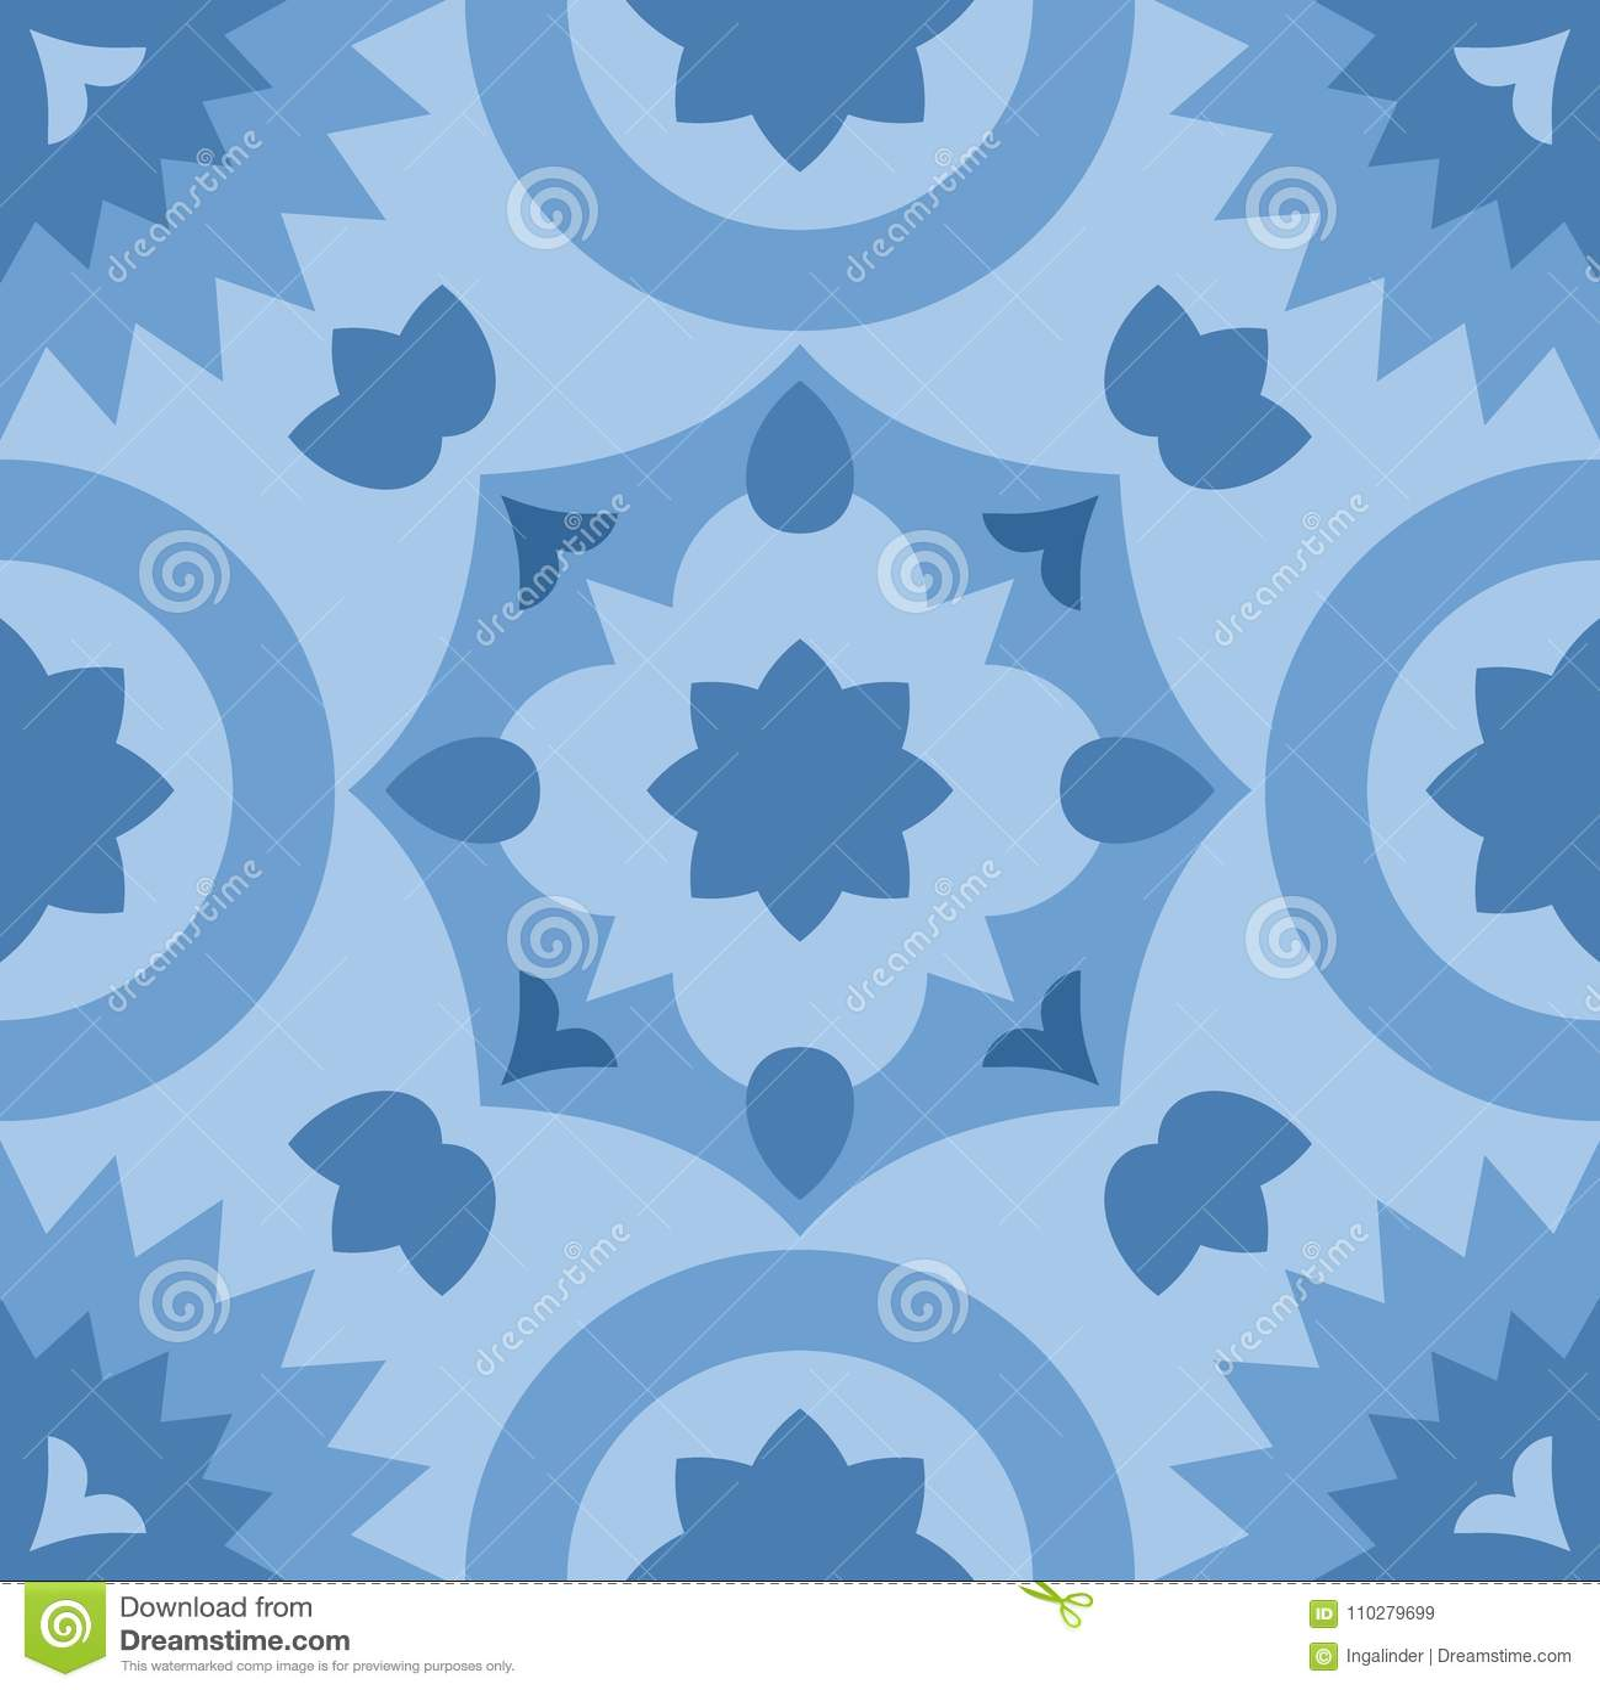 Tile Blue Decorative Floor Tiles Vector Pattern Stock Vector ...